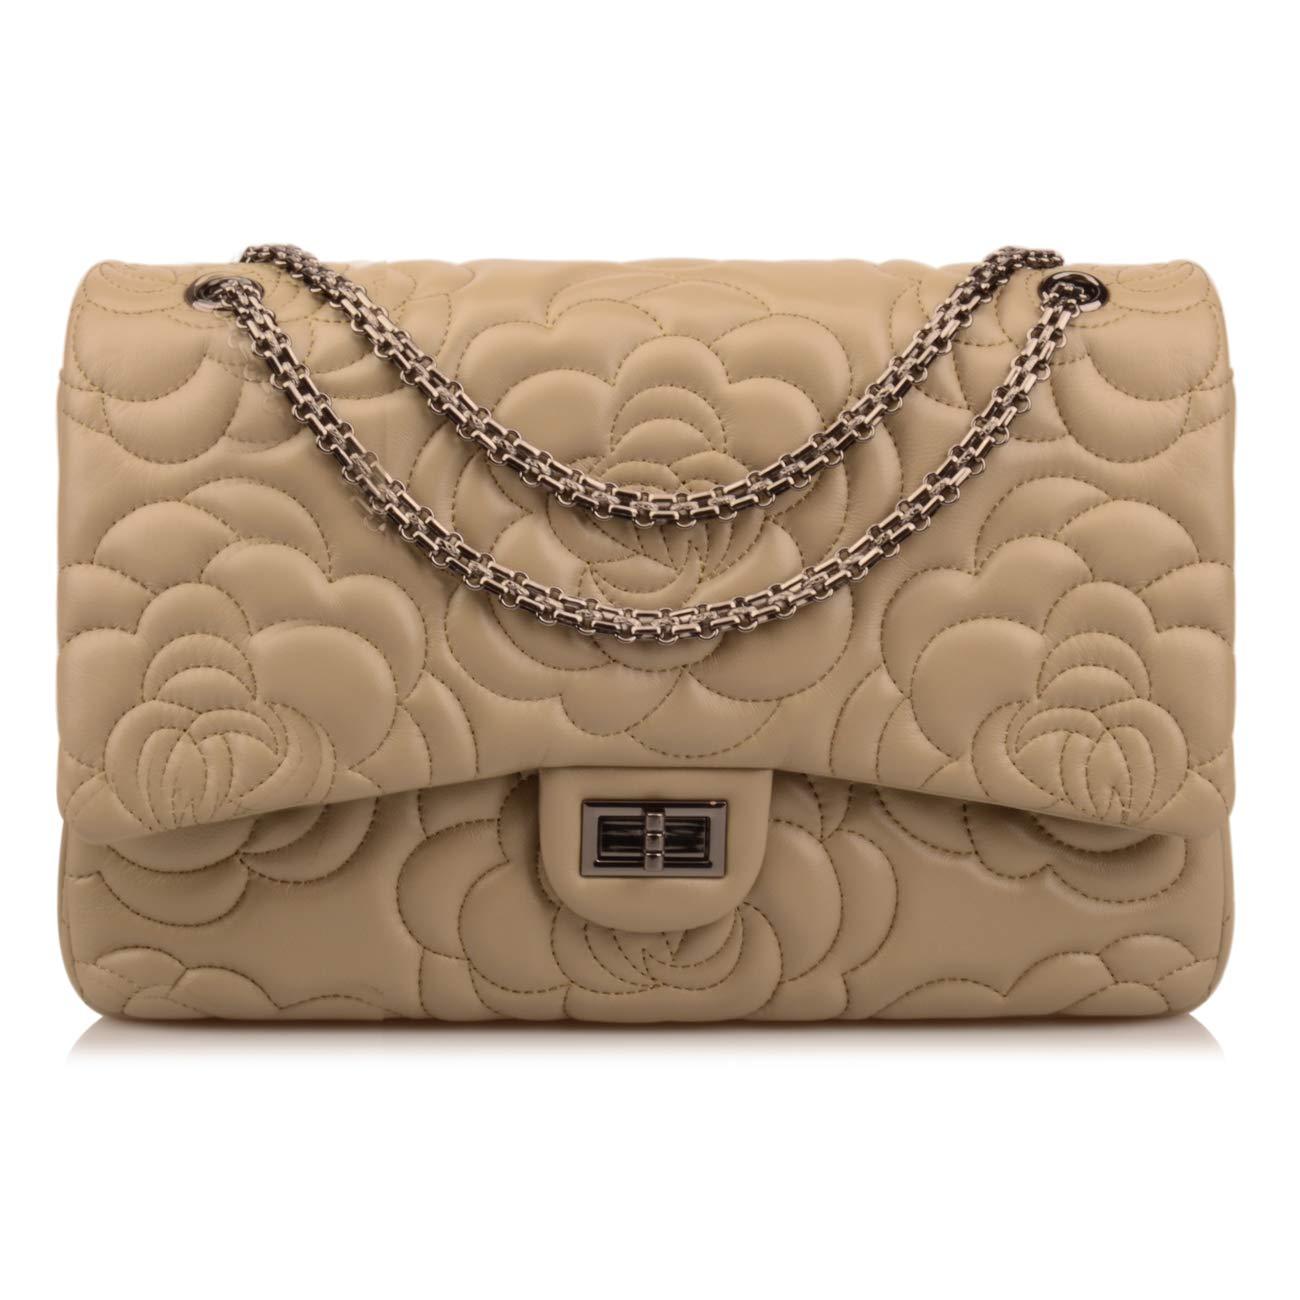 Ainifeel Women's Quilted Oversize Genuine Leather Shoulder Handbag Hobo Bag Purse (X-Large, Greenish taupe flower gunmetal hardware)